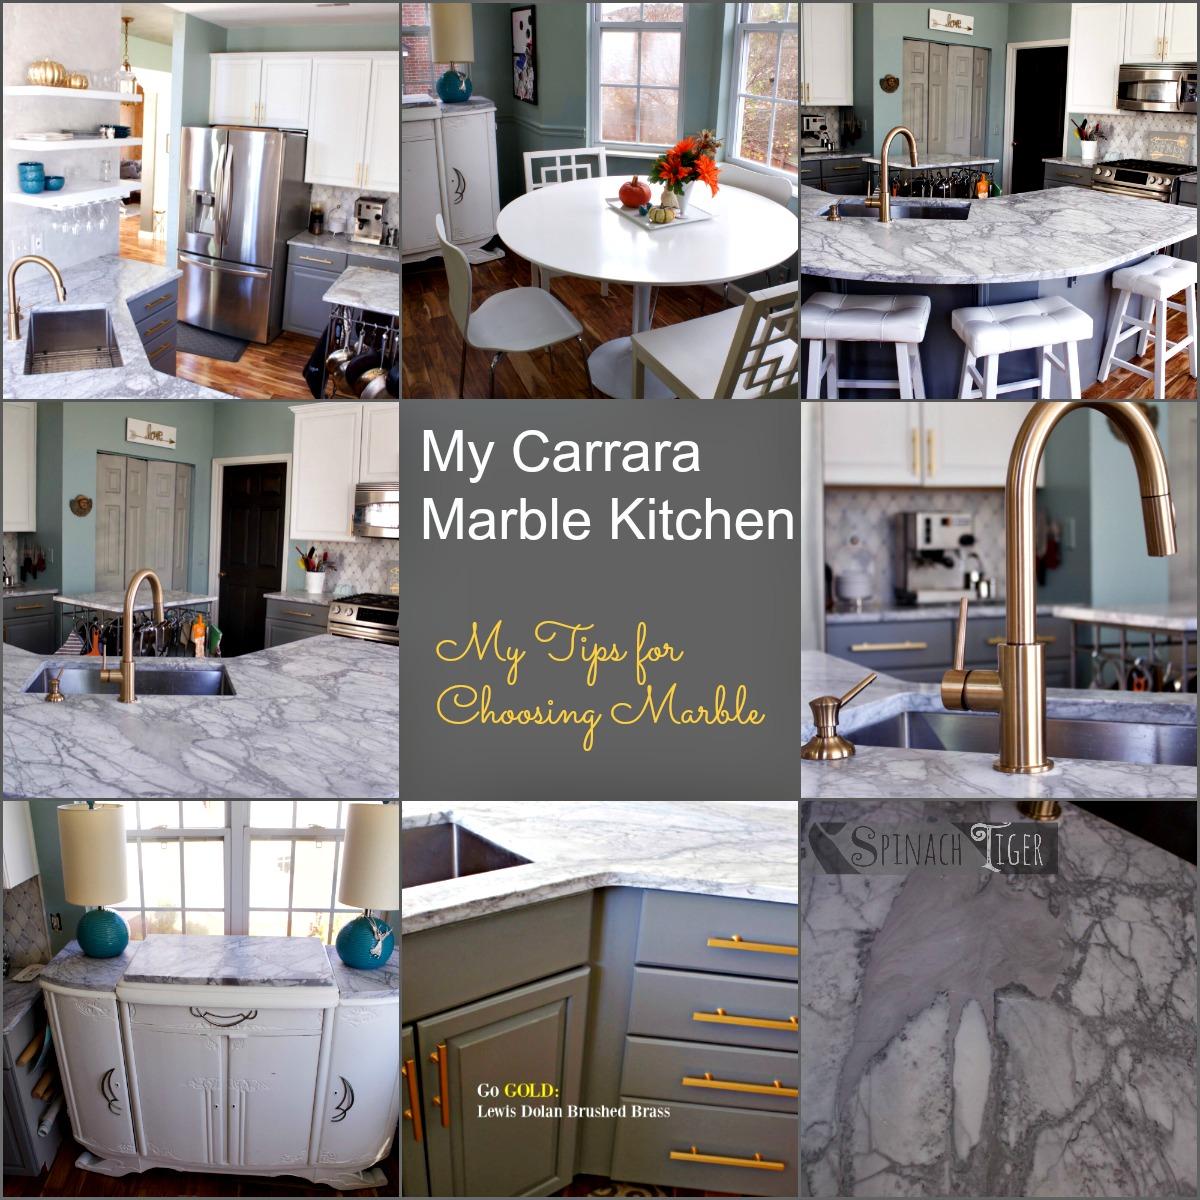 My Carrara Marble